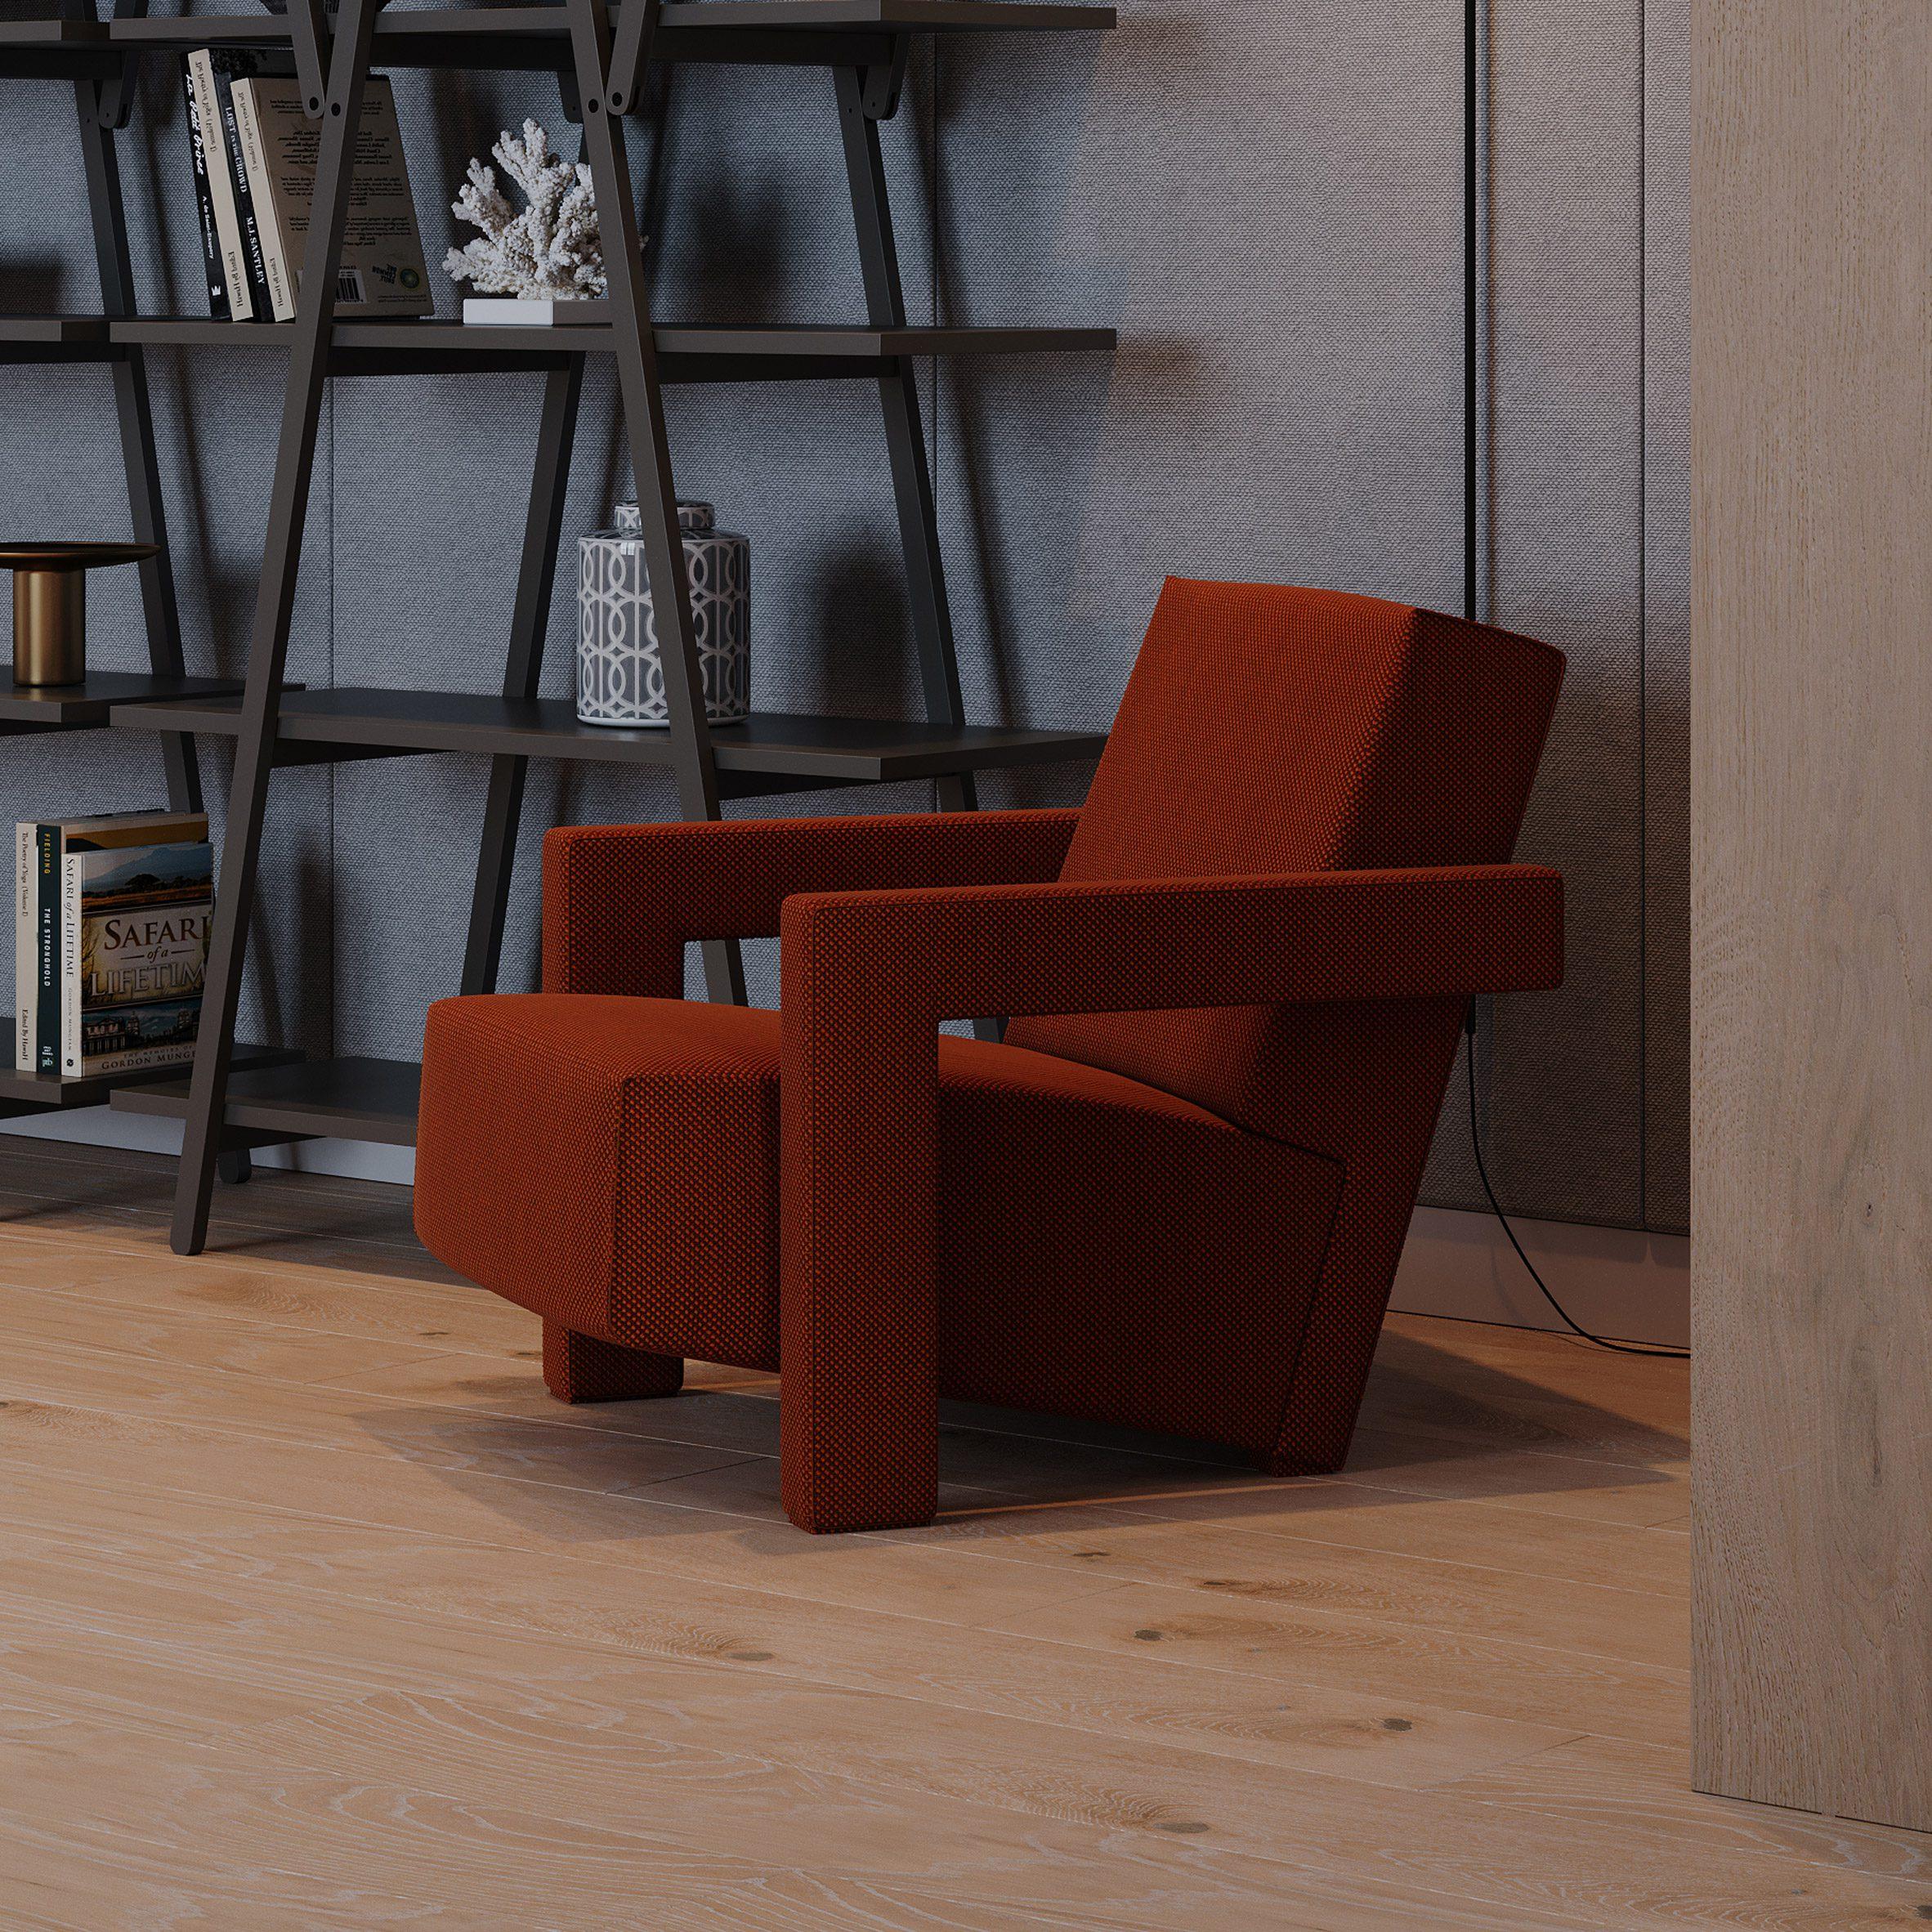 Utrecht Pro armchair by Gerrit Rietveld for Cassina